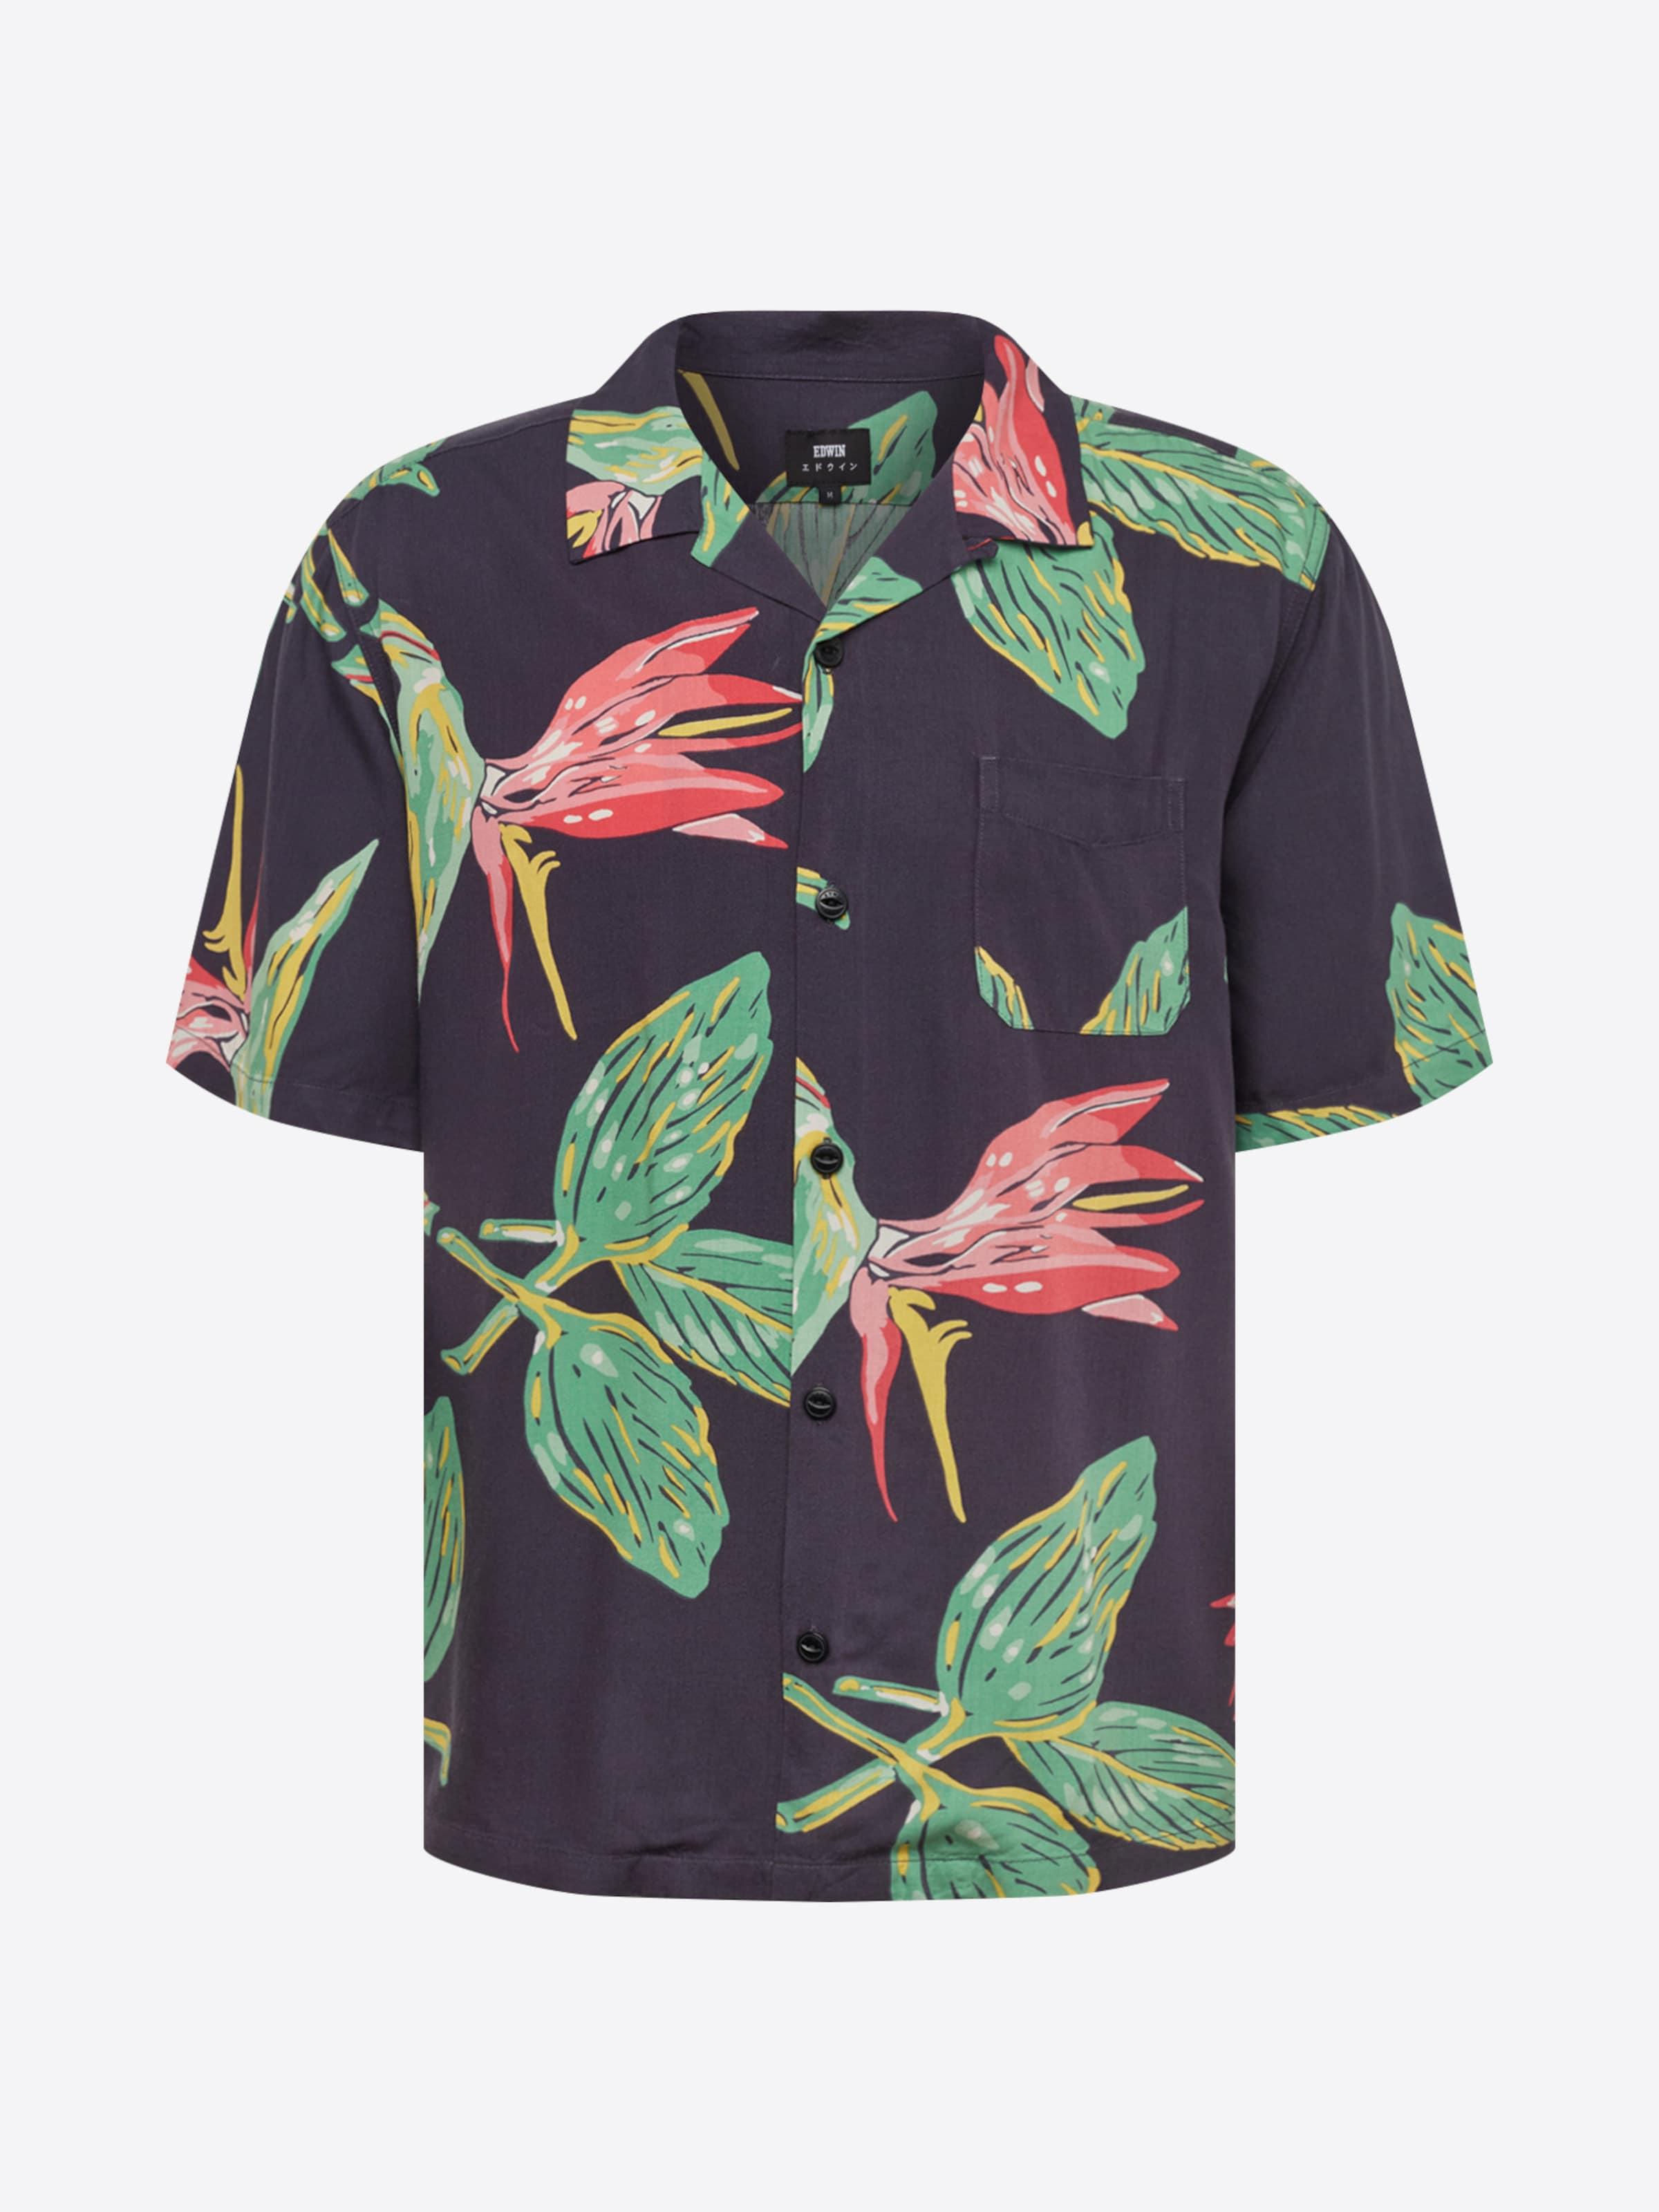 Shirt' Noir VertRouge Chemise En Edwin 'resort A3Rqj5L4